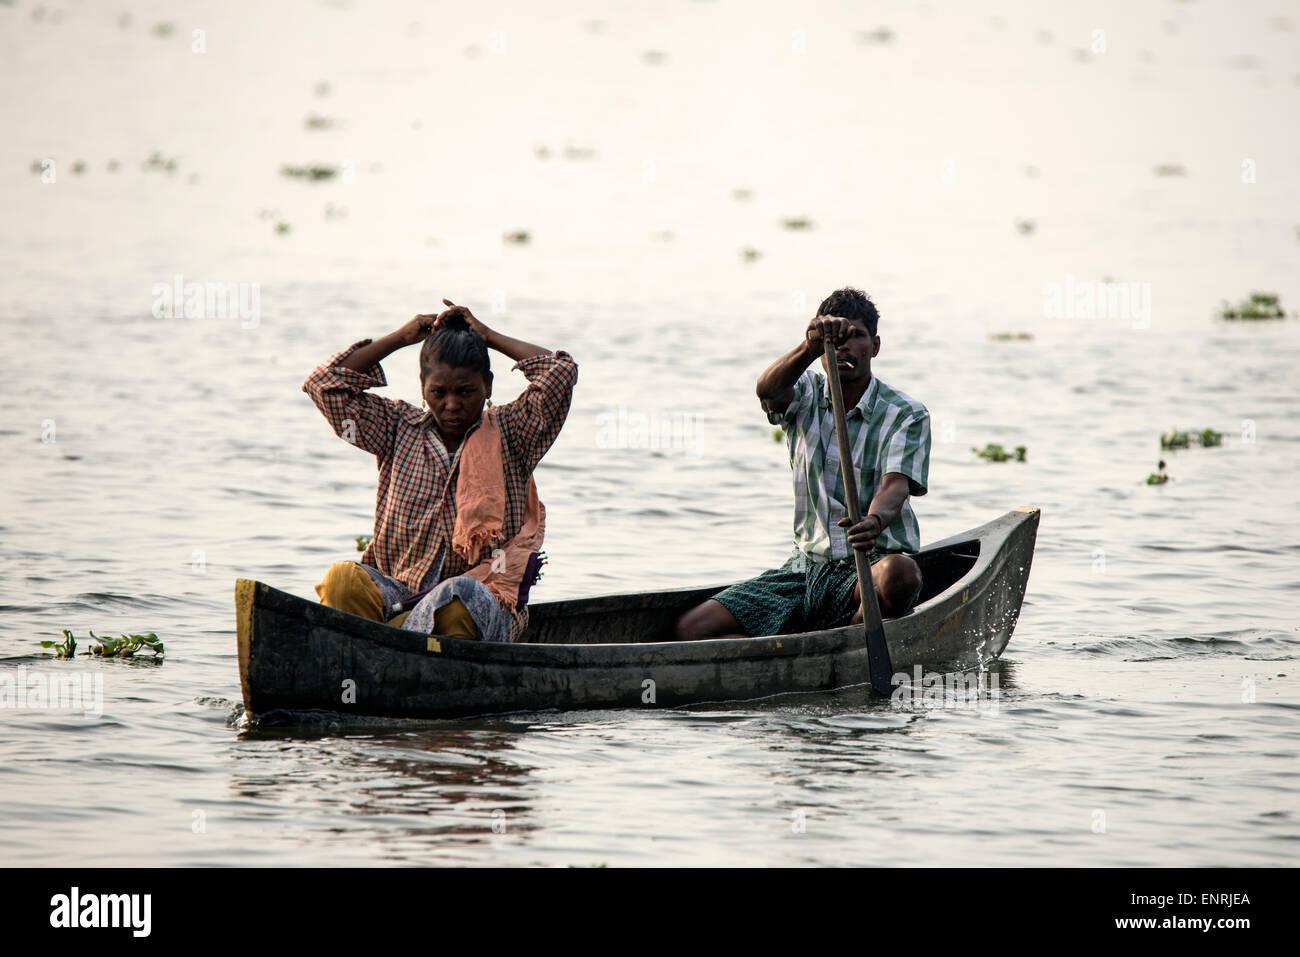 Indian In Canoe Stock Photos Amp Indian In Canoe Stock